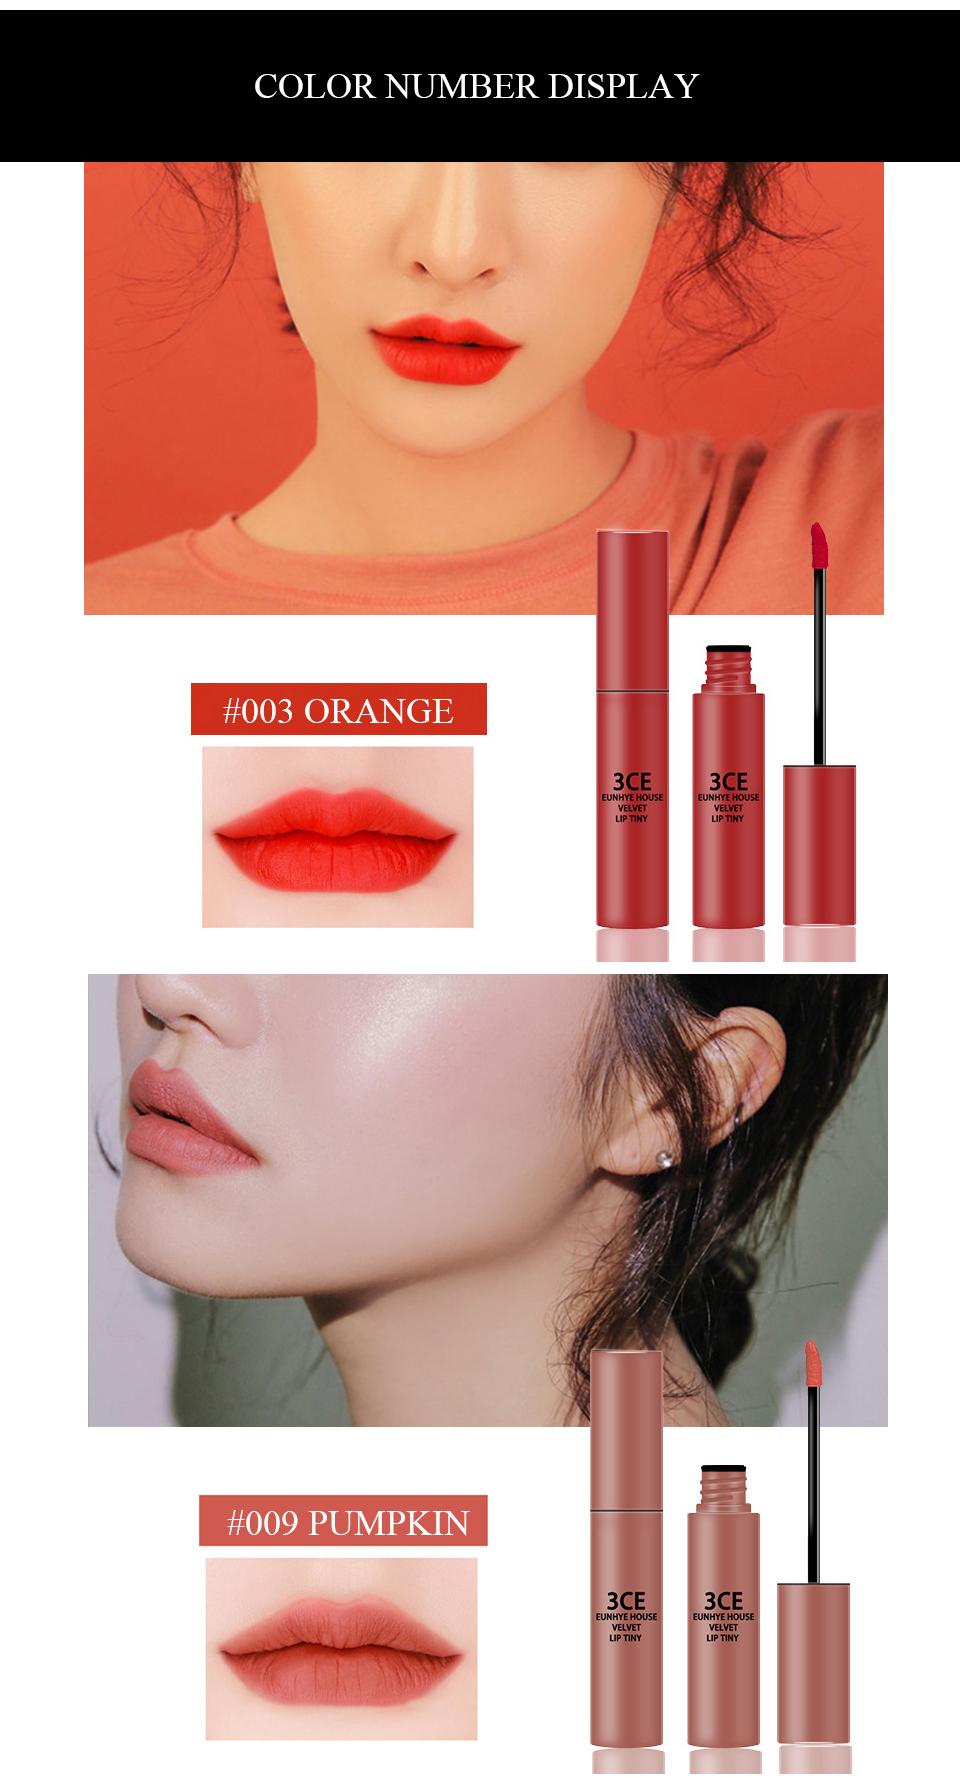 3CE Eunhye House Brand New Lip Cosmetics 3 colors Lip glaze Moisturizer Long-lasting Lip Makeup for common 9